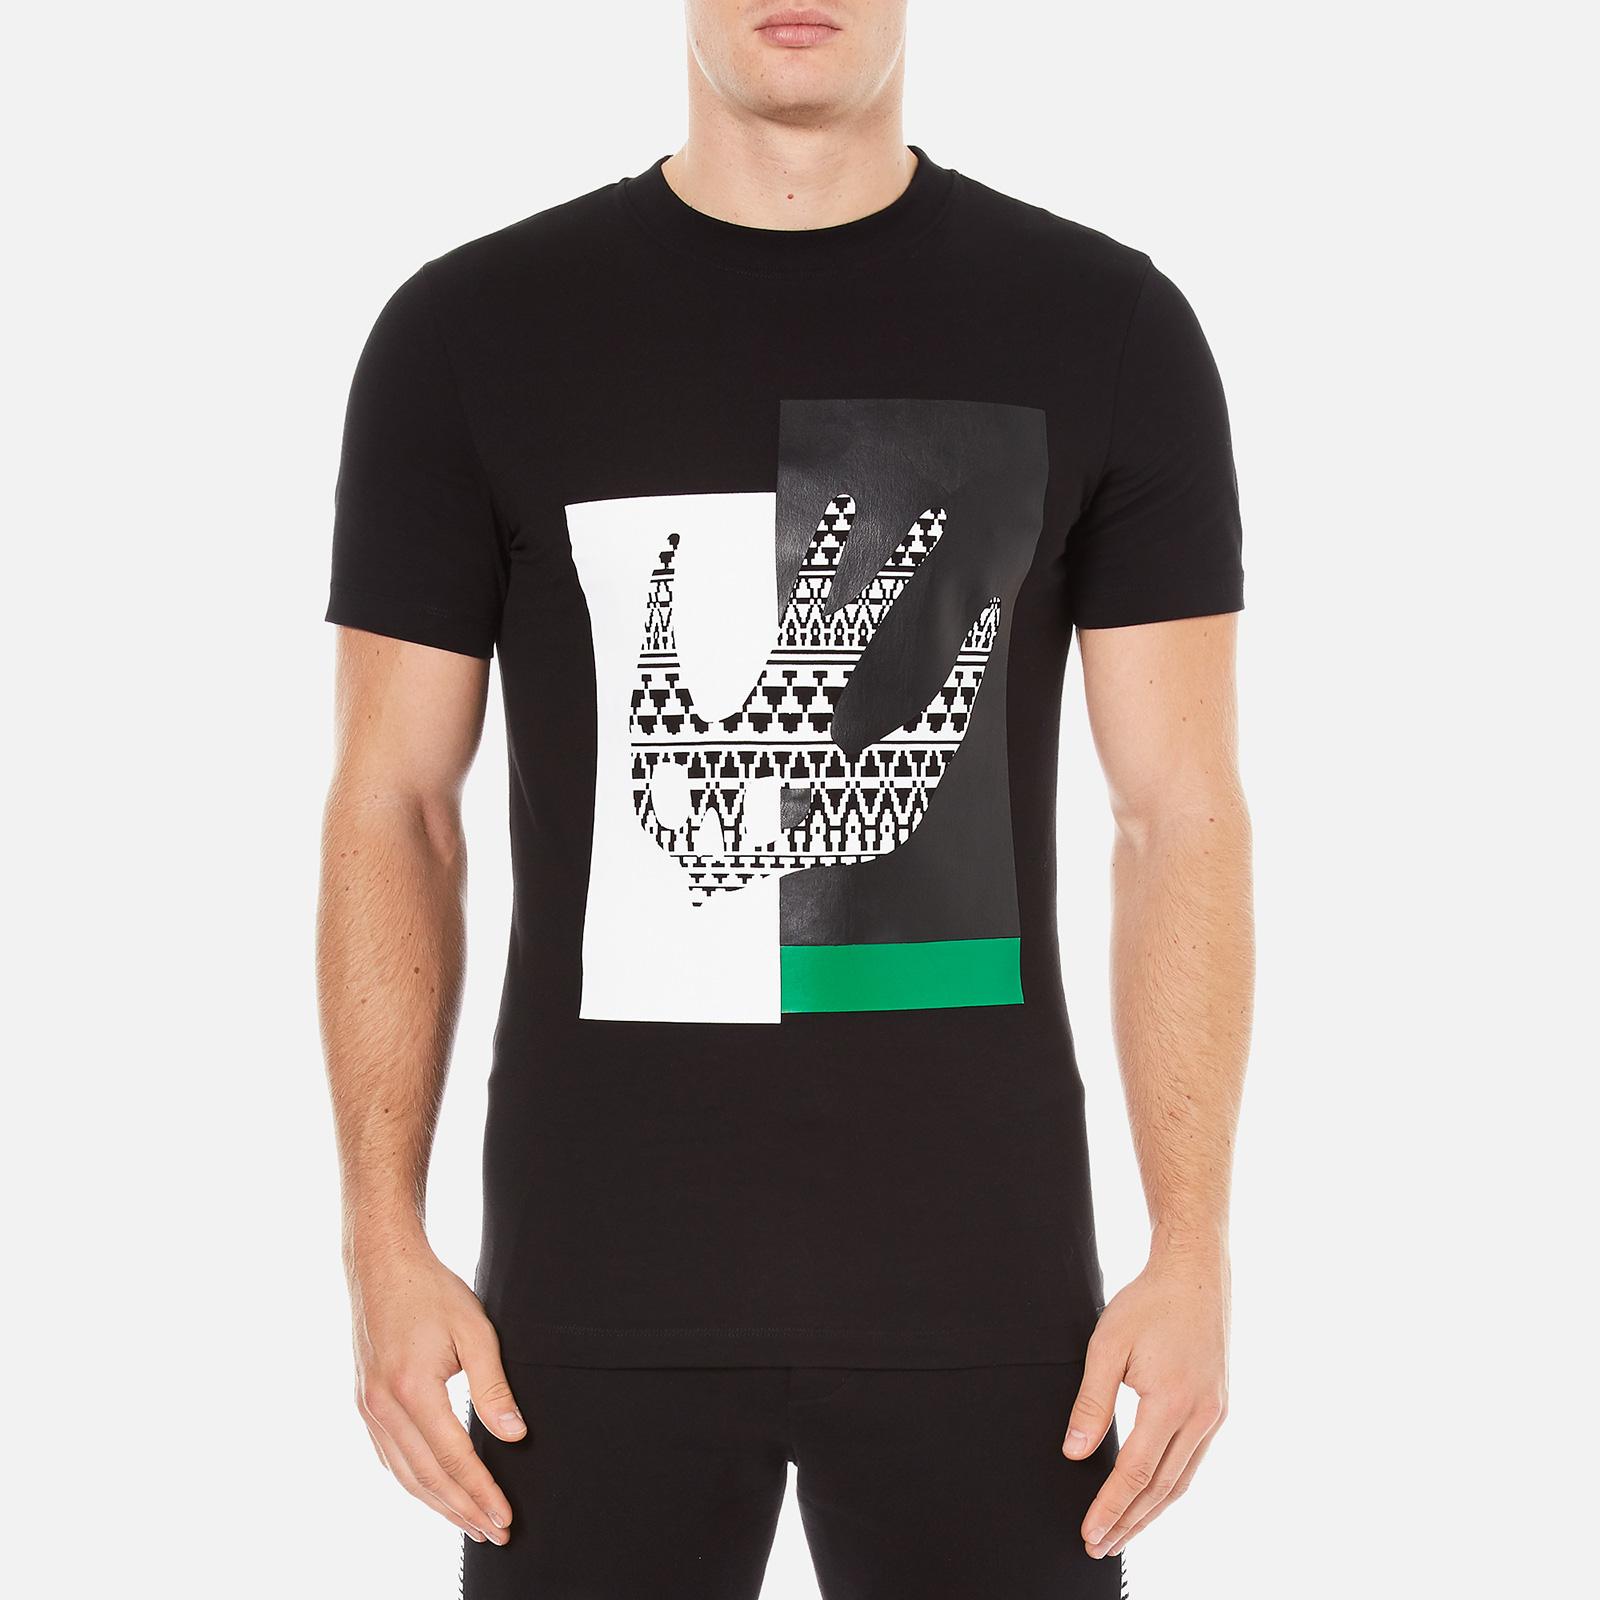 52bbc74cb57 McQ Alexander McQueen Men s Abstract Swallow Short Sleeve Crew T-Shirt - Darkest  Black - Free UK Delivery over £50